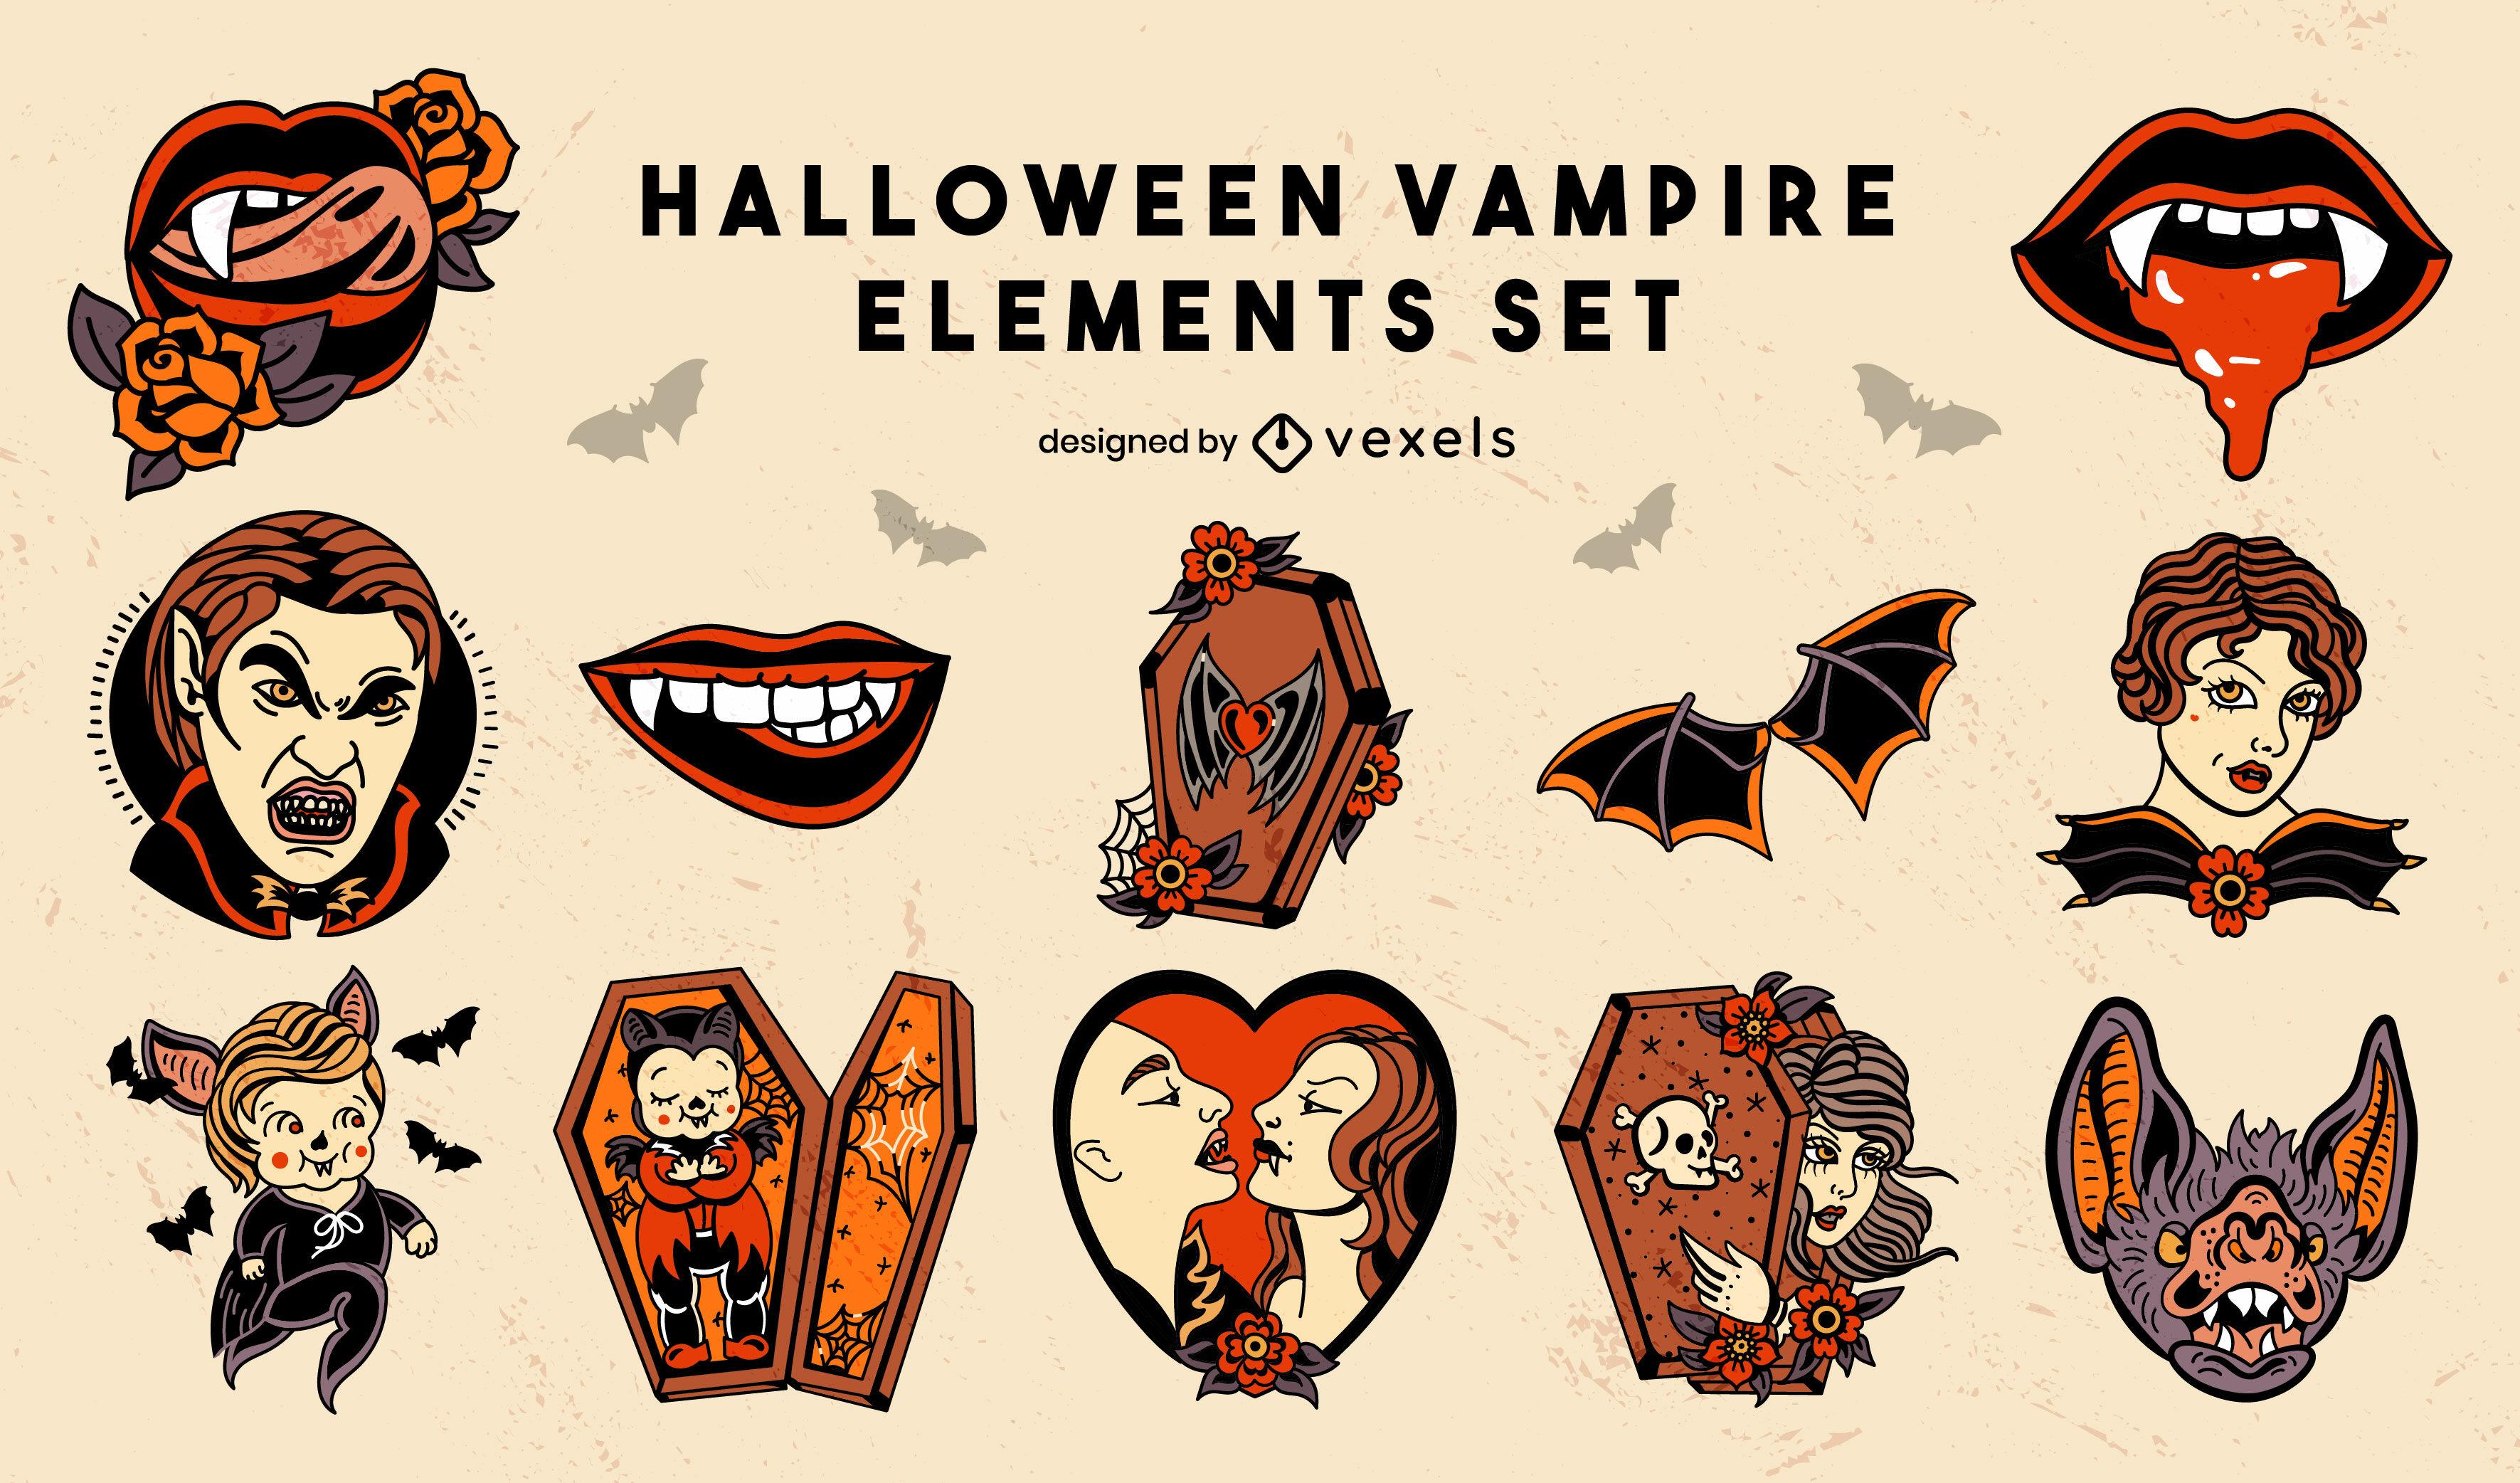 Vampire elements old school tattoo style